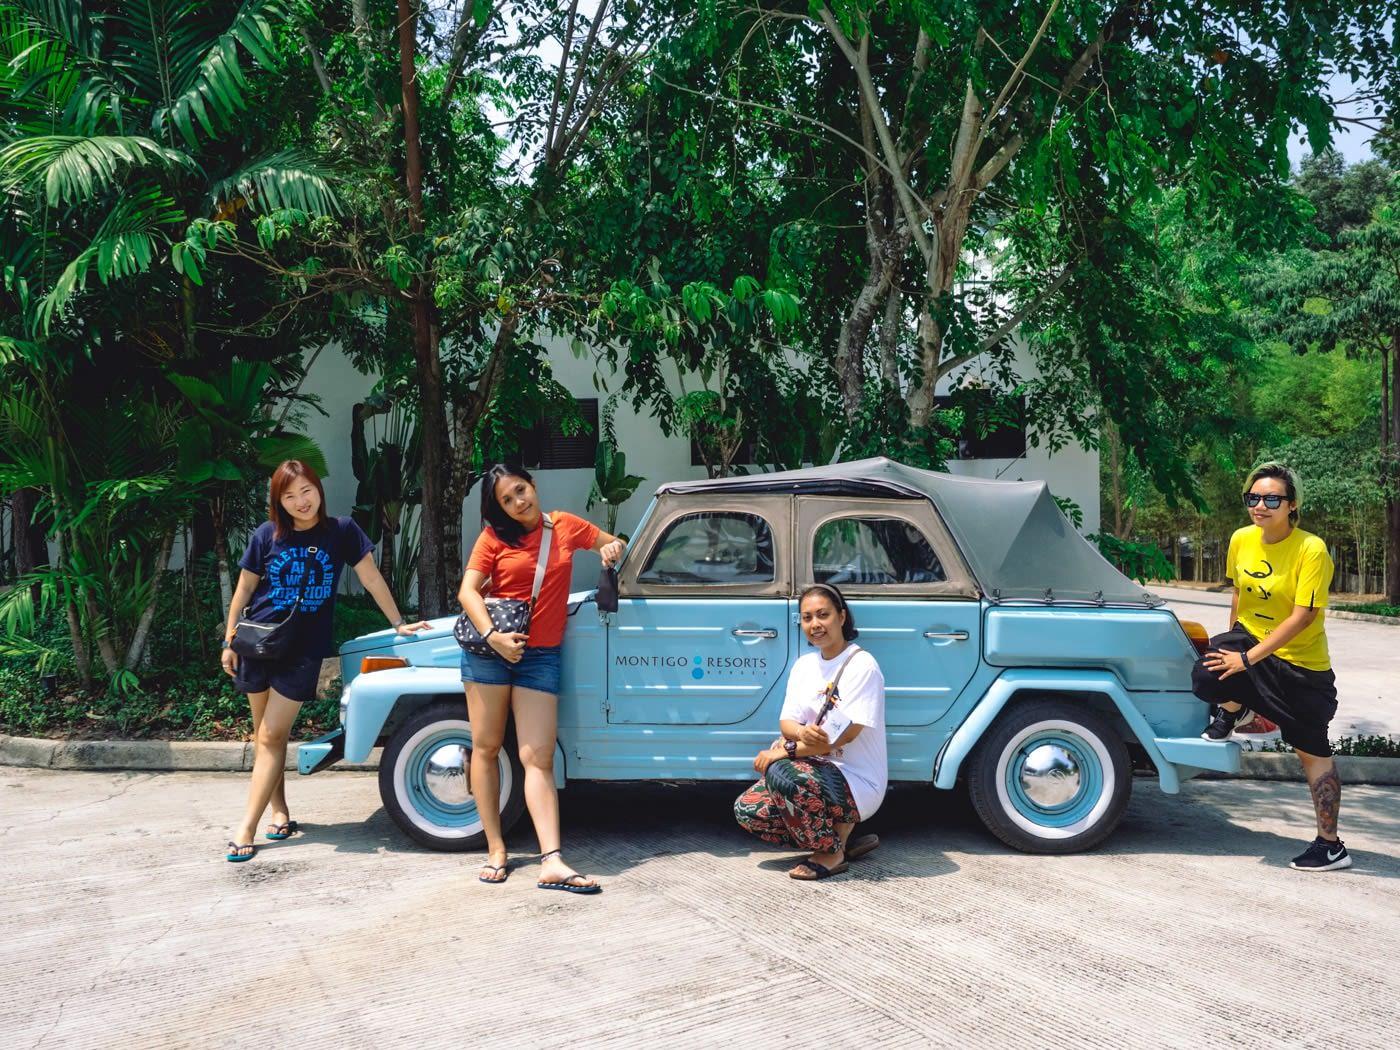 Indonesia - Montigo - Wefie on arrival with a vintage car